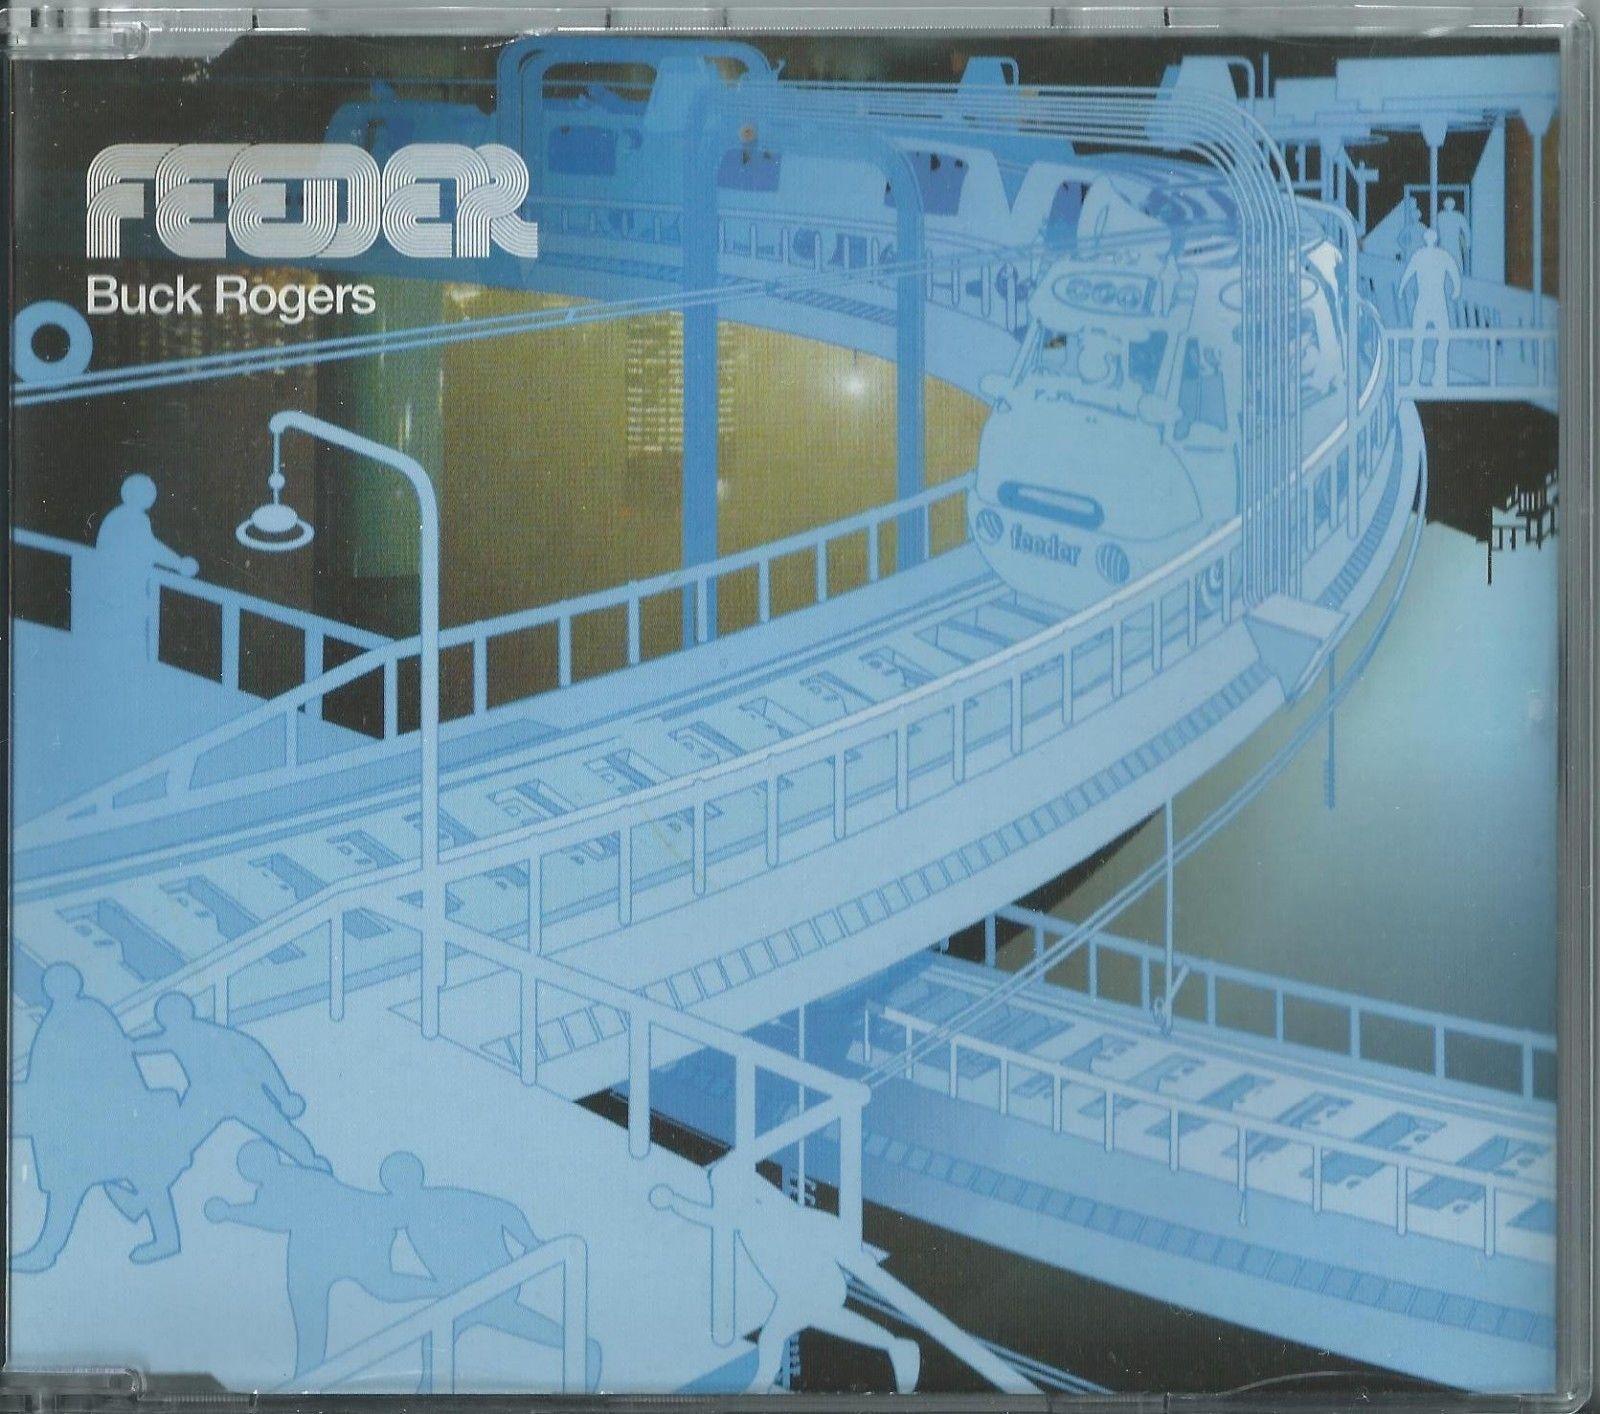 FEEDER - BUCK ROGERS 2001 UK 3 ENHANCED TRACK CD SINGLE PART 2 ECHO-ECSCX106